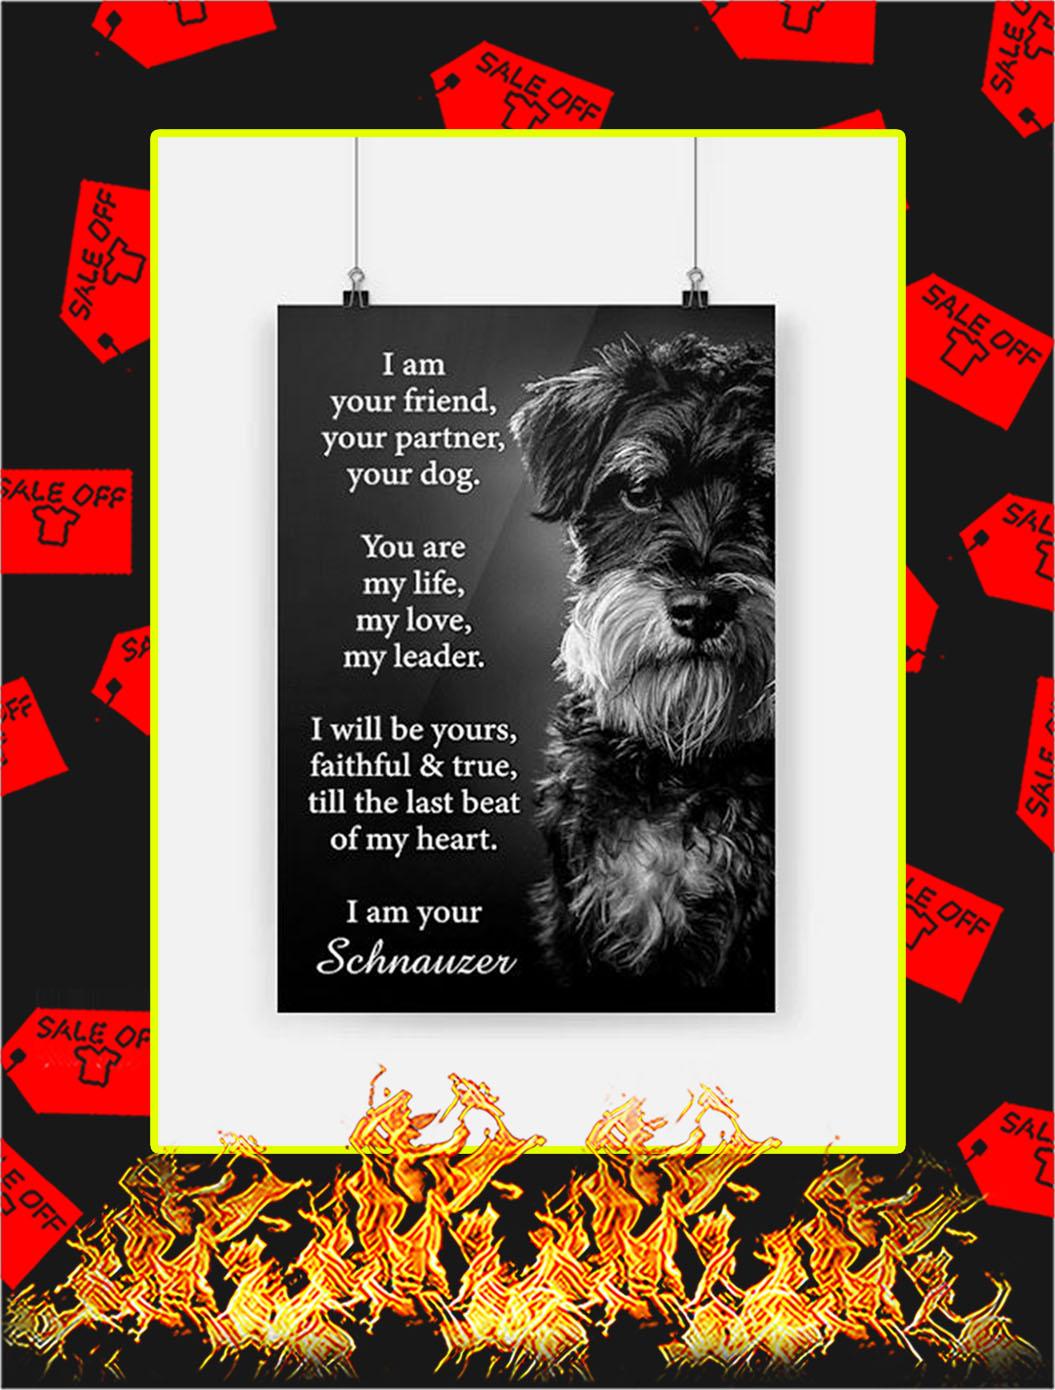 Schnauzer I Am Your Friend Poster - A3